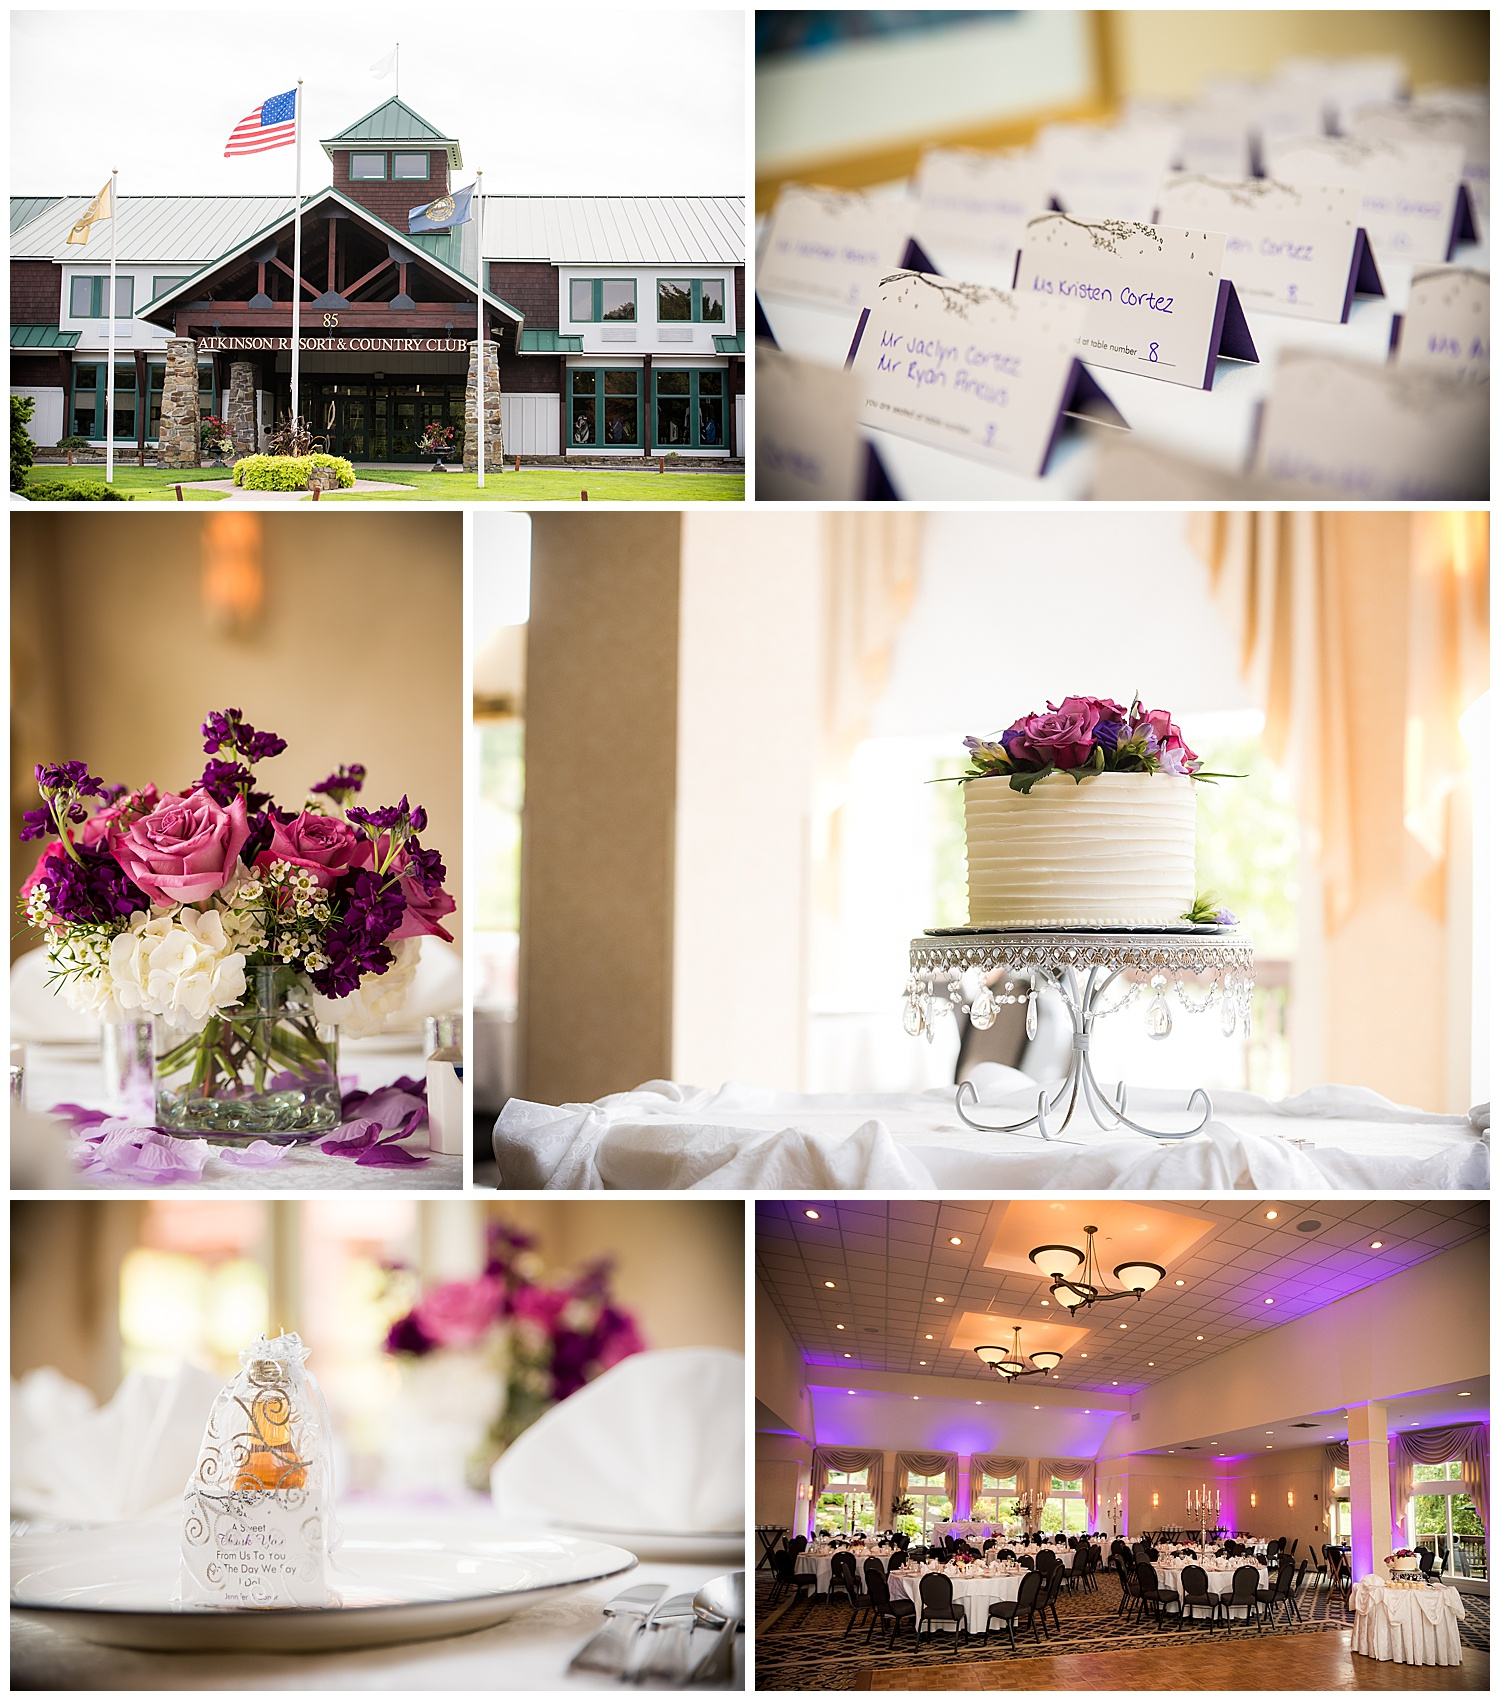 Atkinson Resort & Country Club - Details